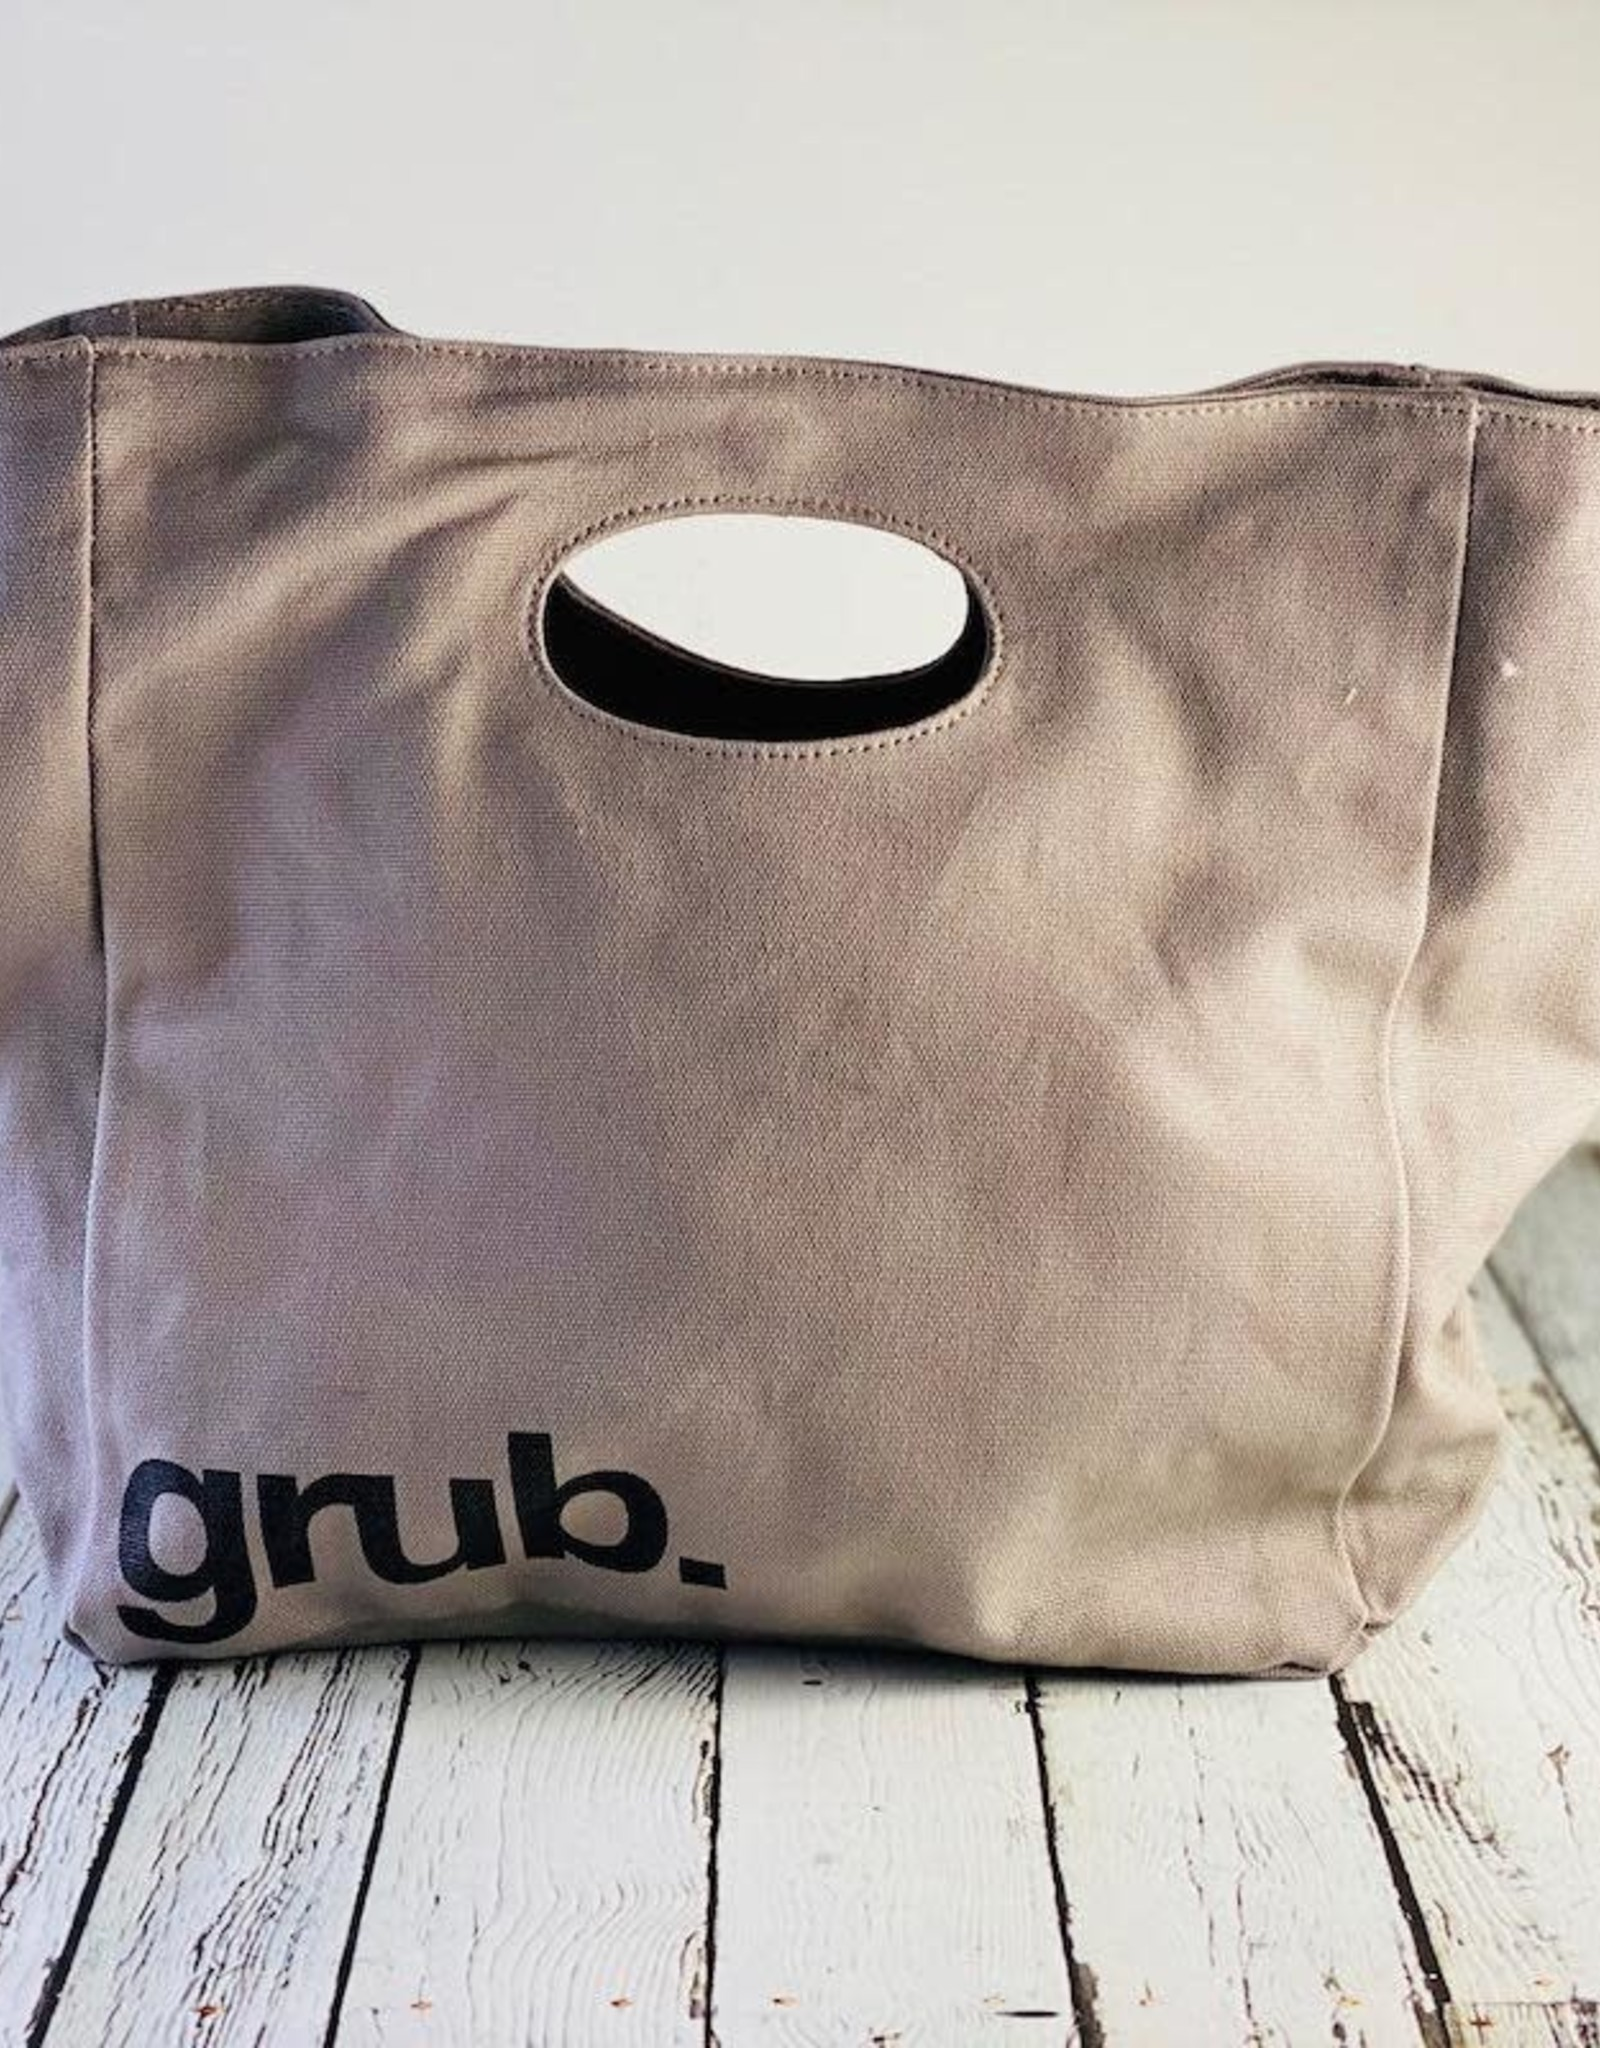 Classic Grub Bag